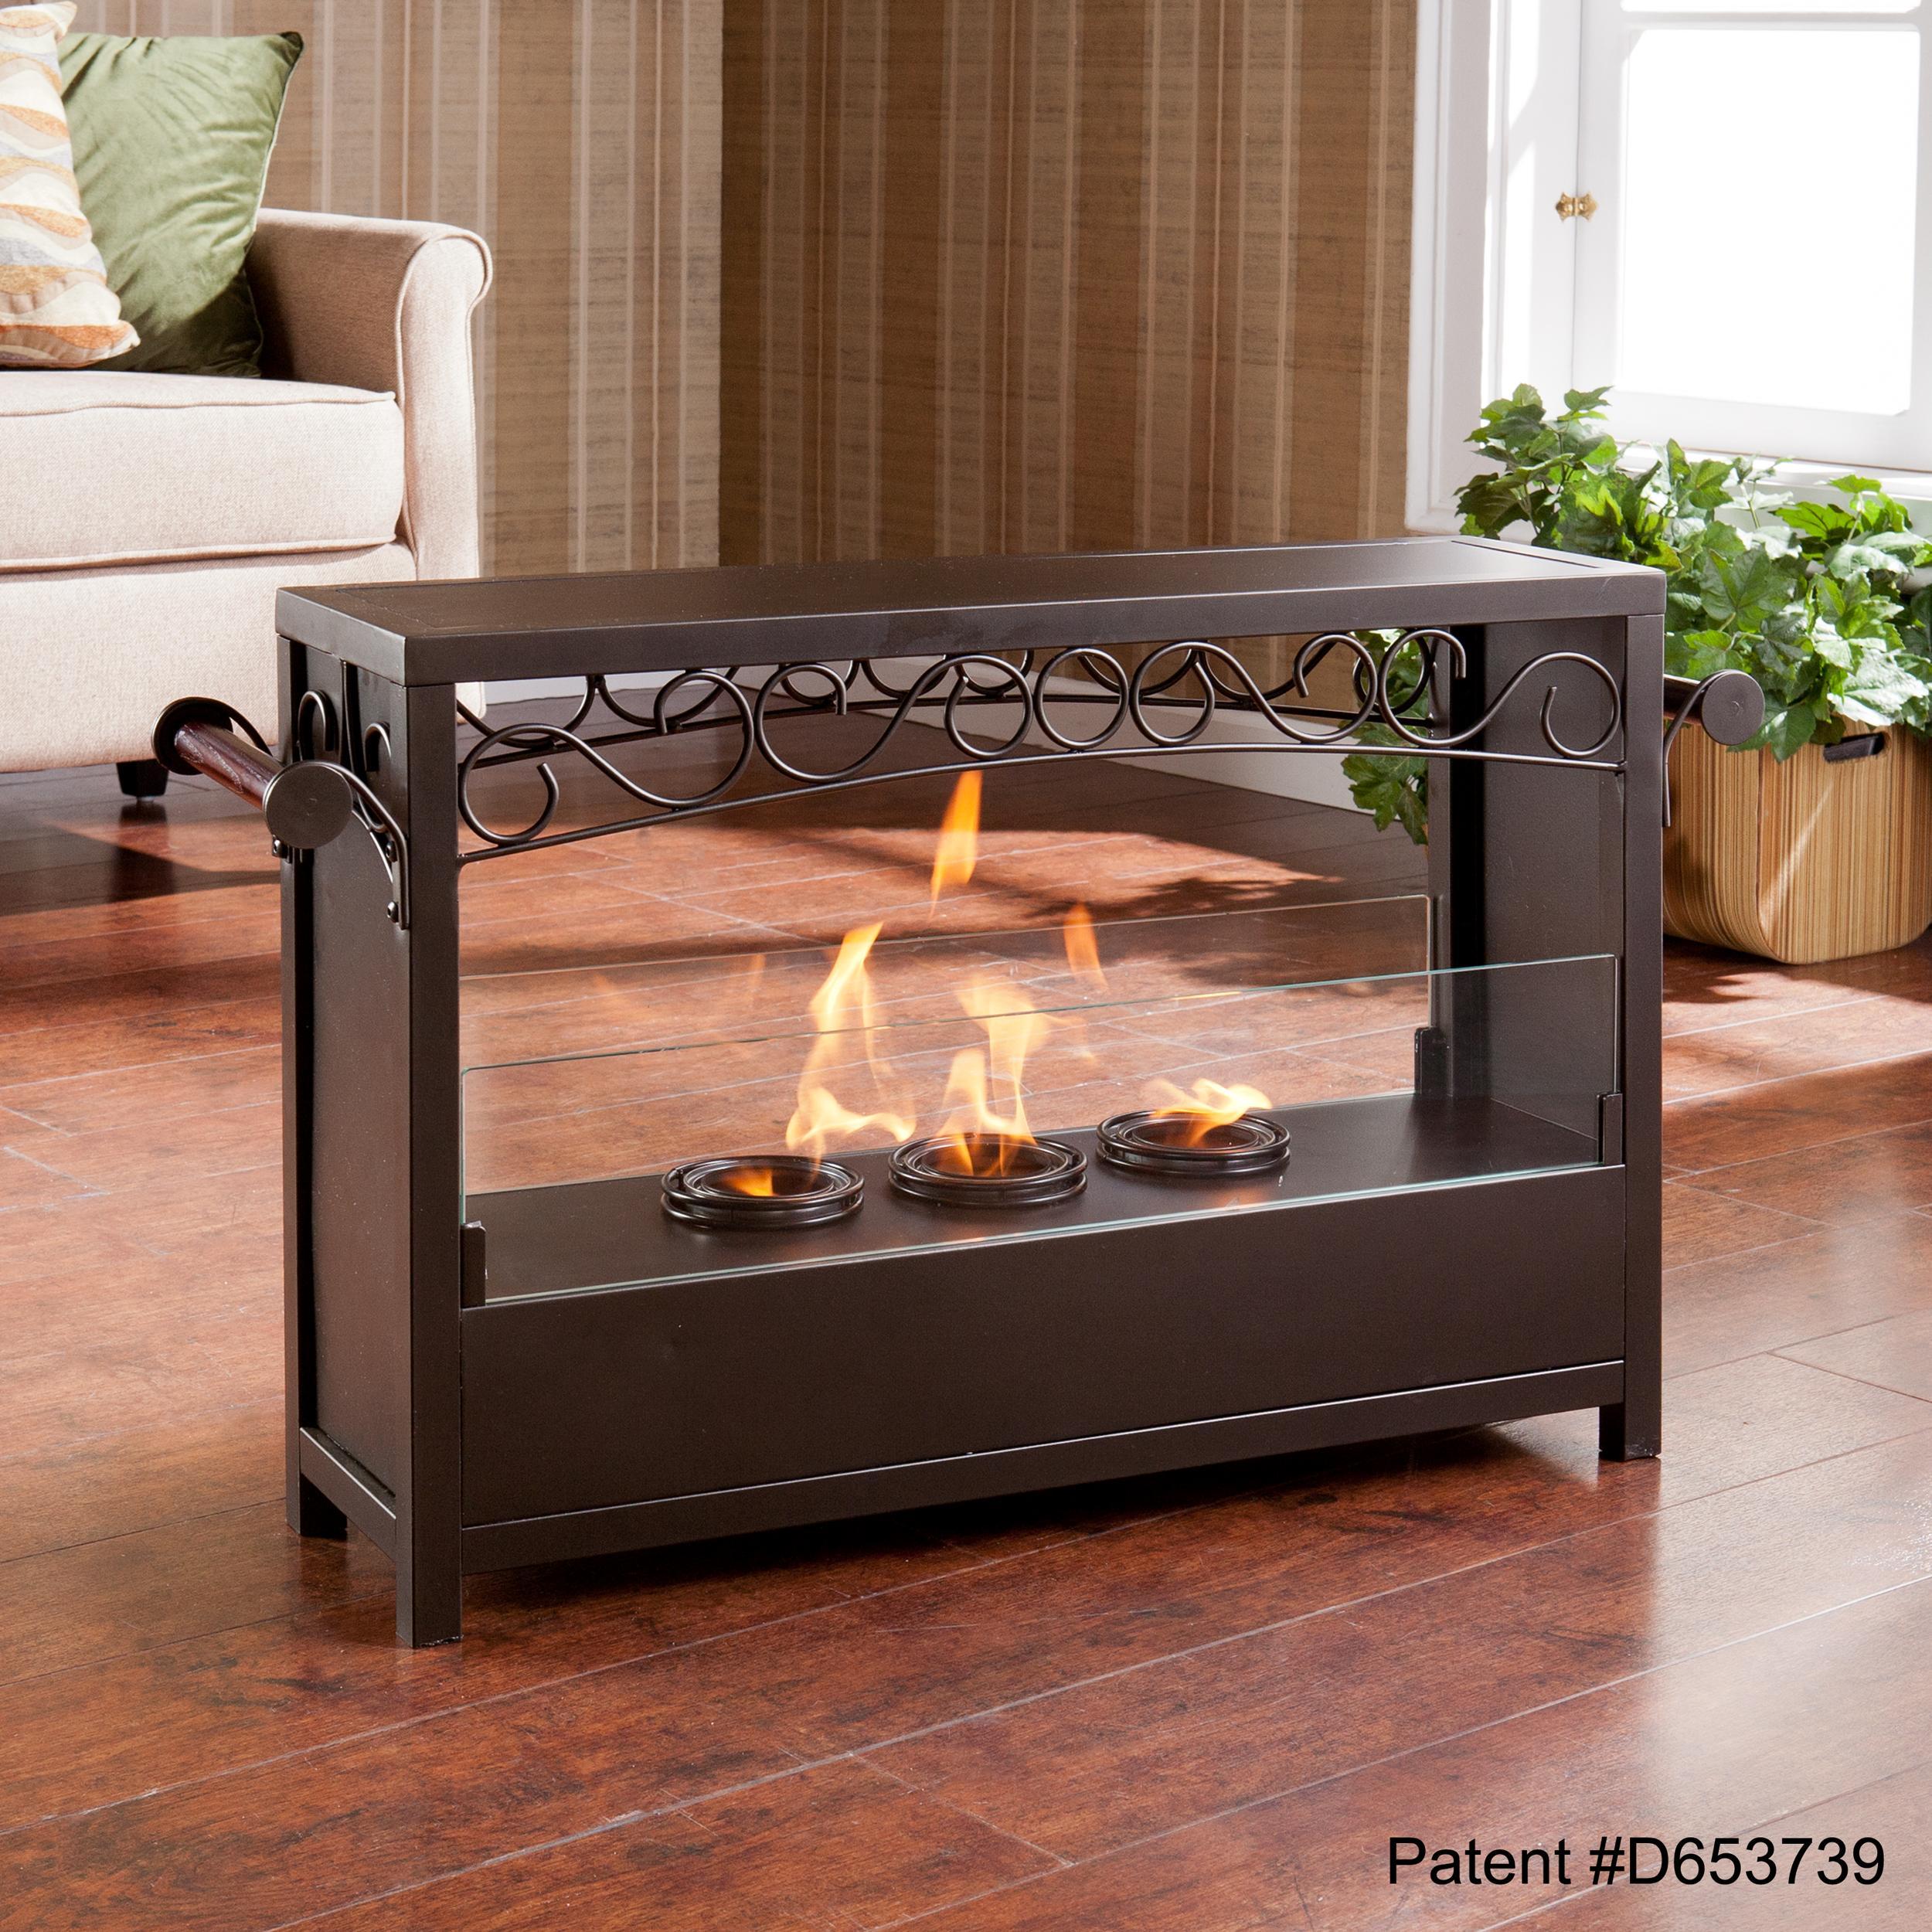 Amazon.com: SEI AMZ1485 Acosta Portable Indoor/Outdoor Fireplace ...